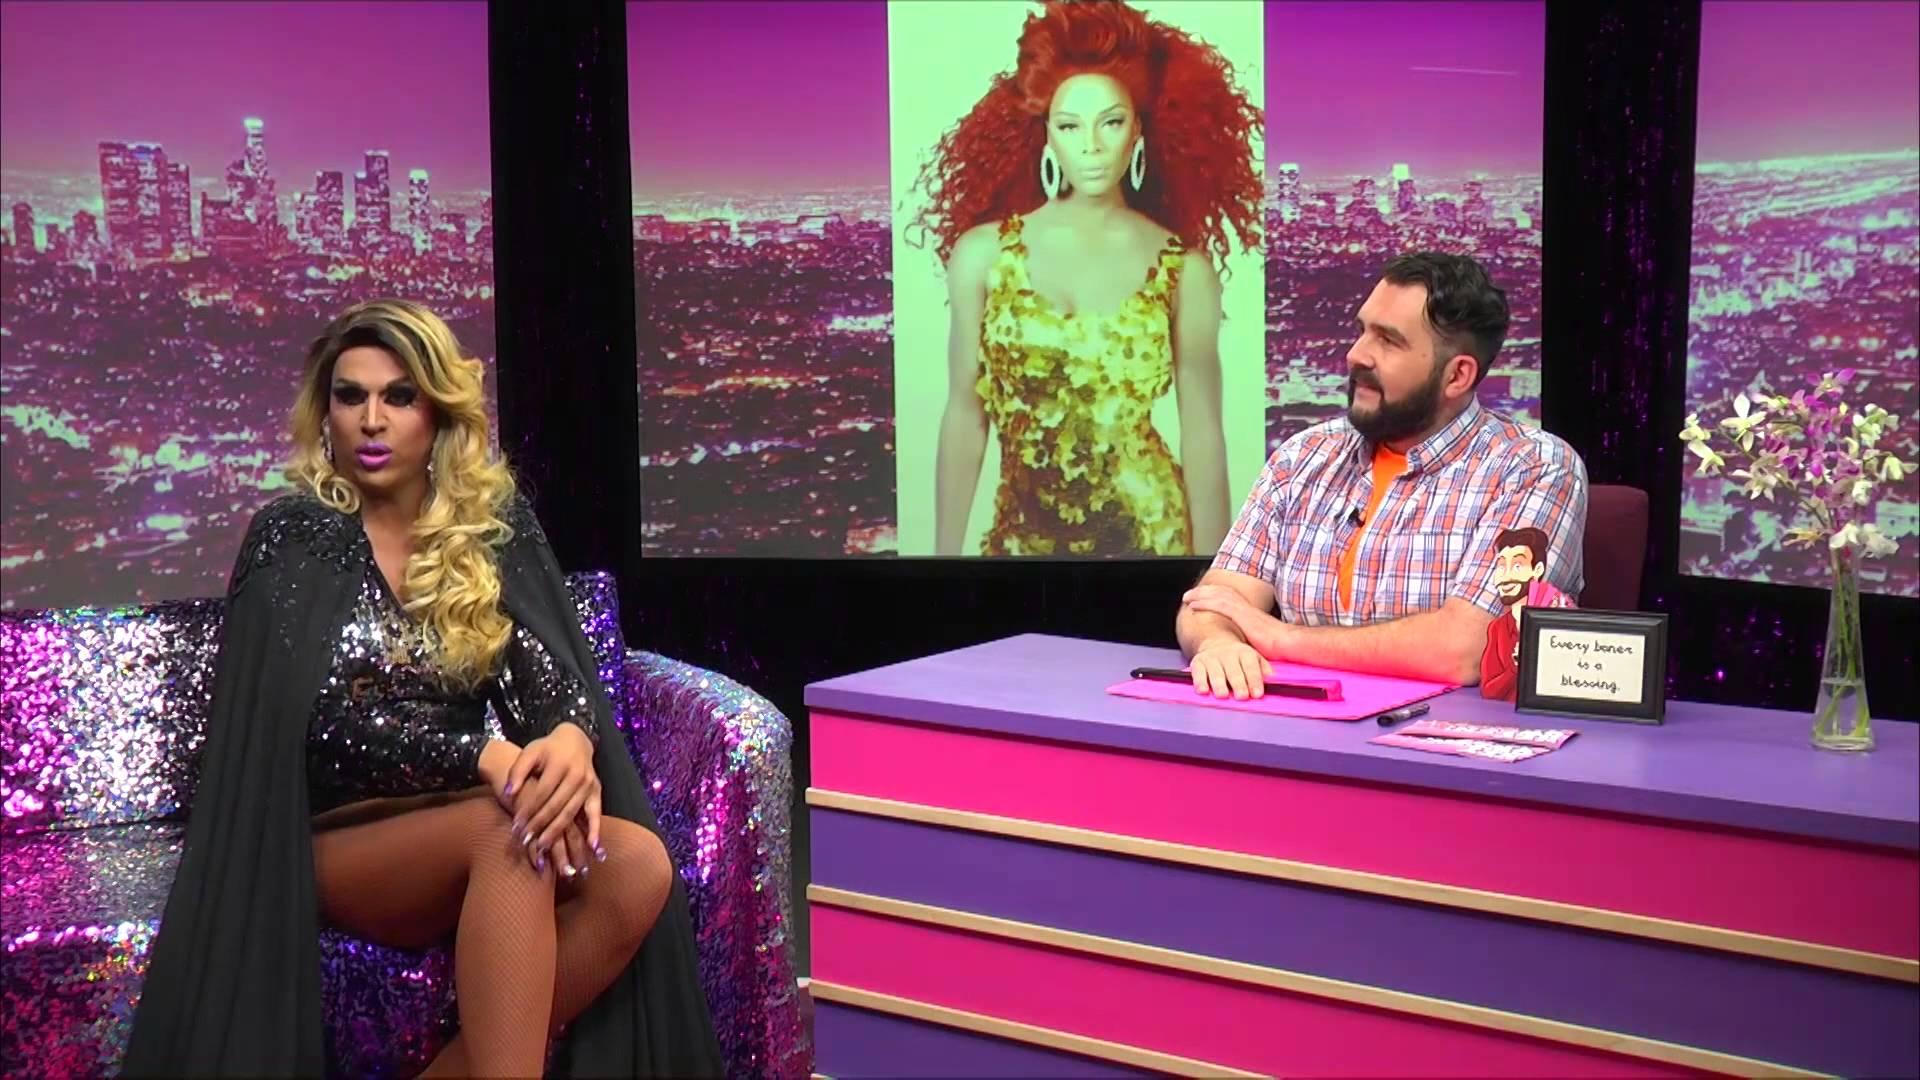 Rupaul Drag Race Star Jessica Wild: Look at Huh SUPERSIZED PT 2